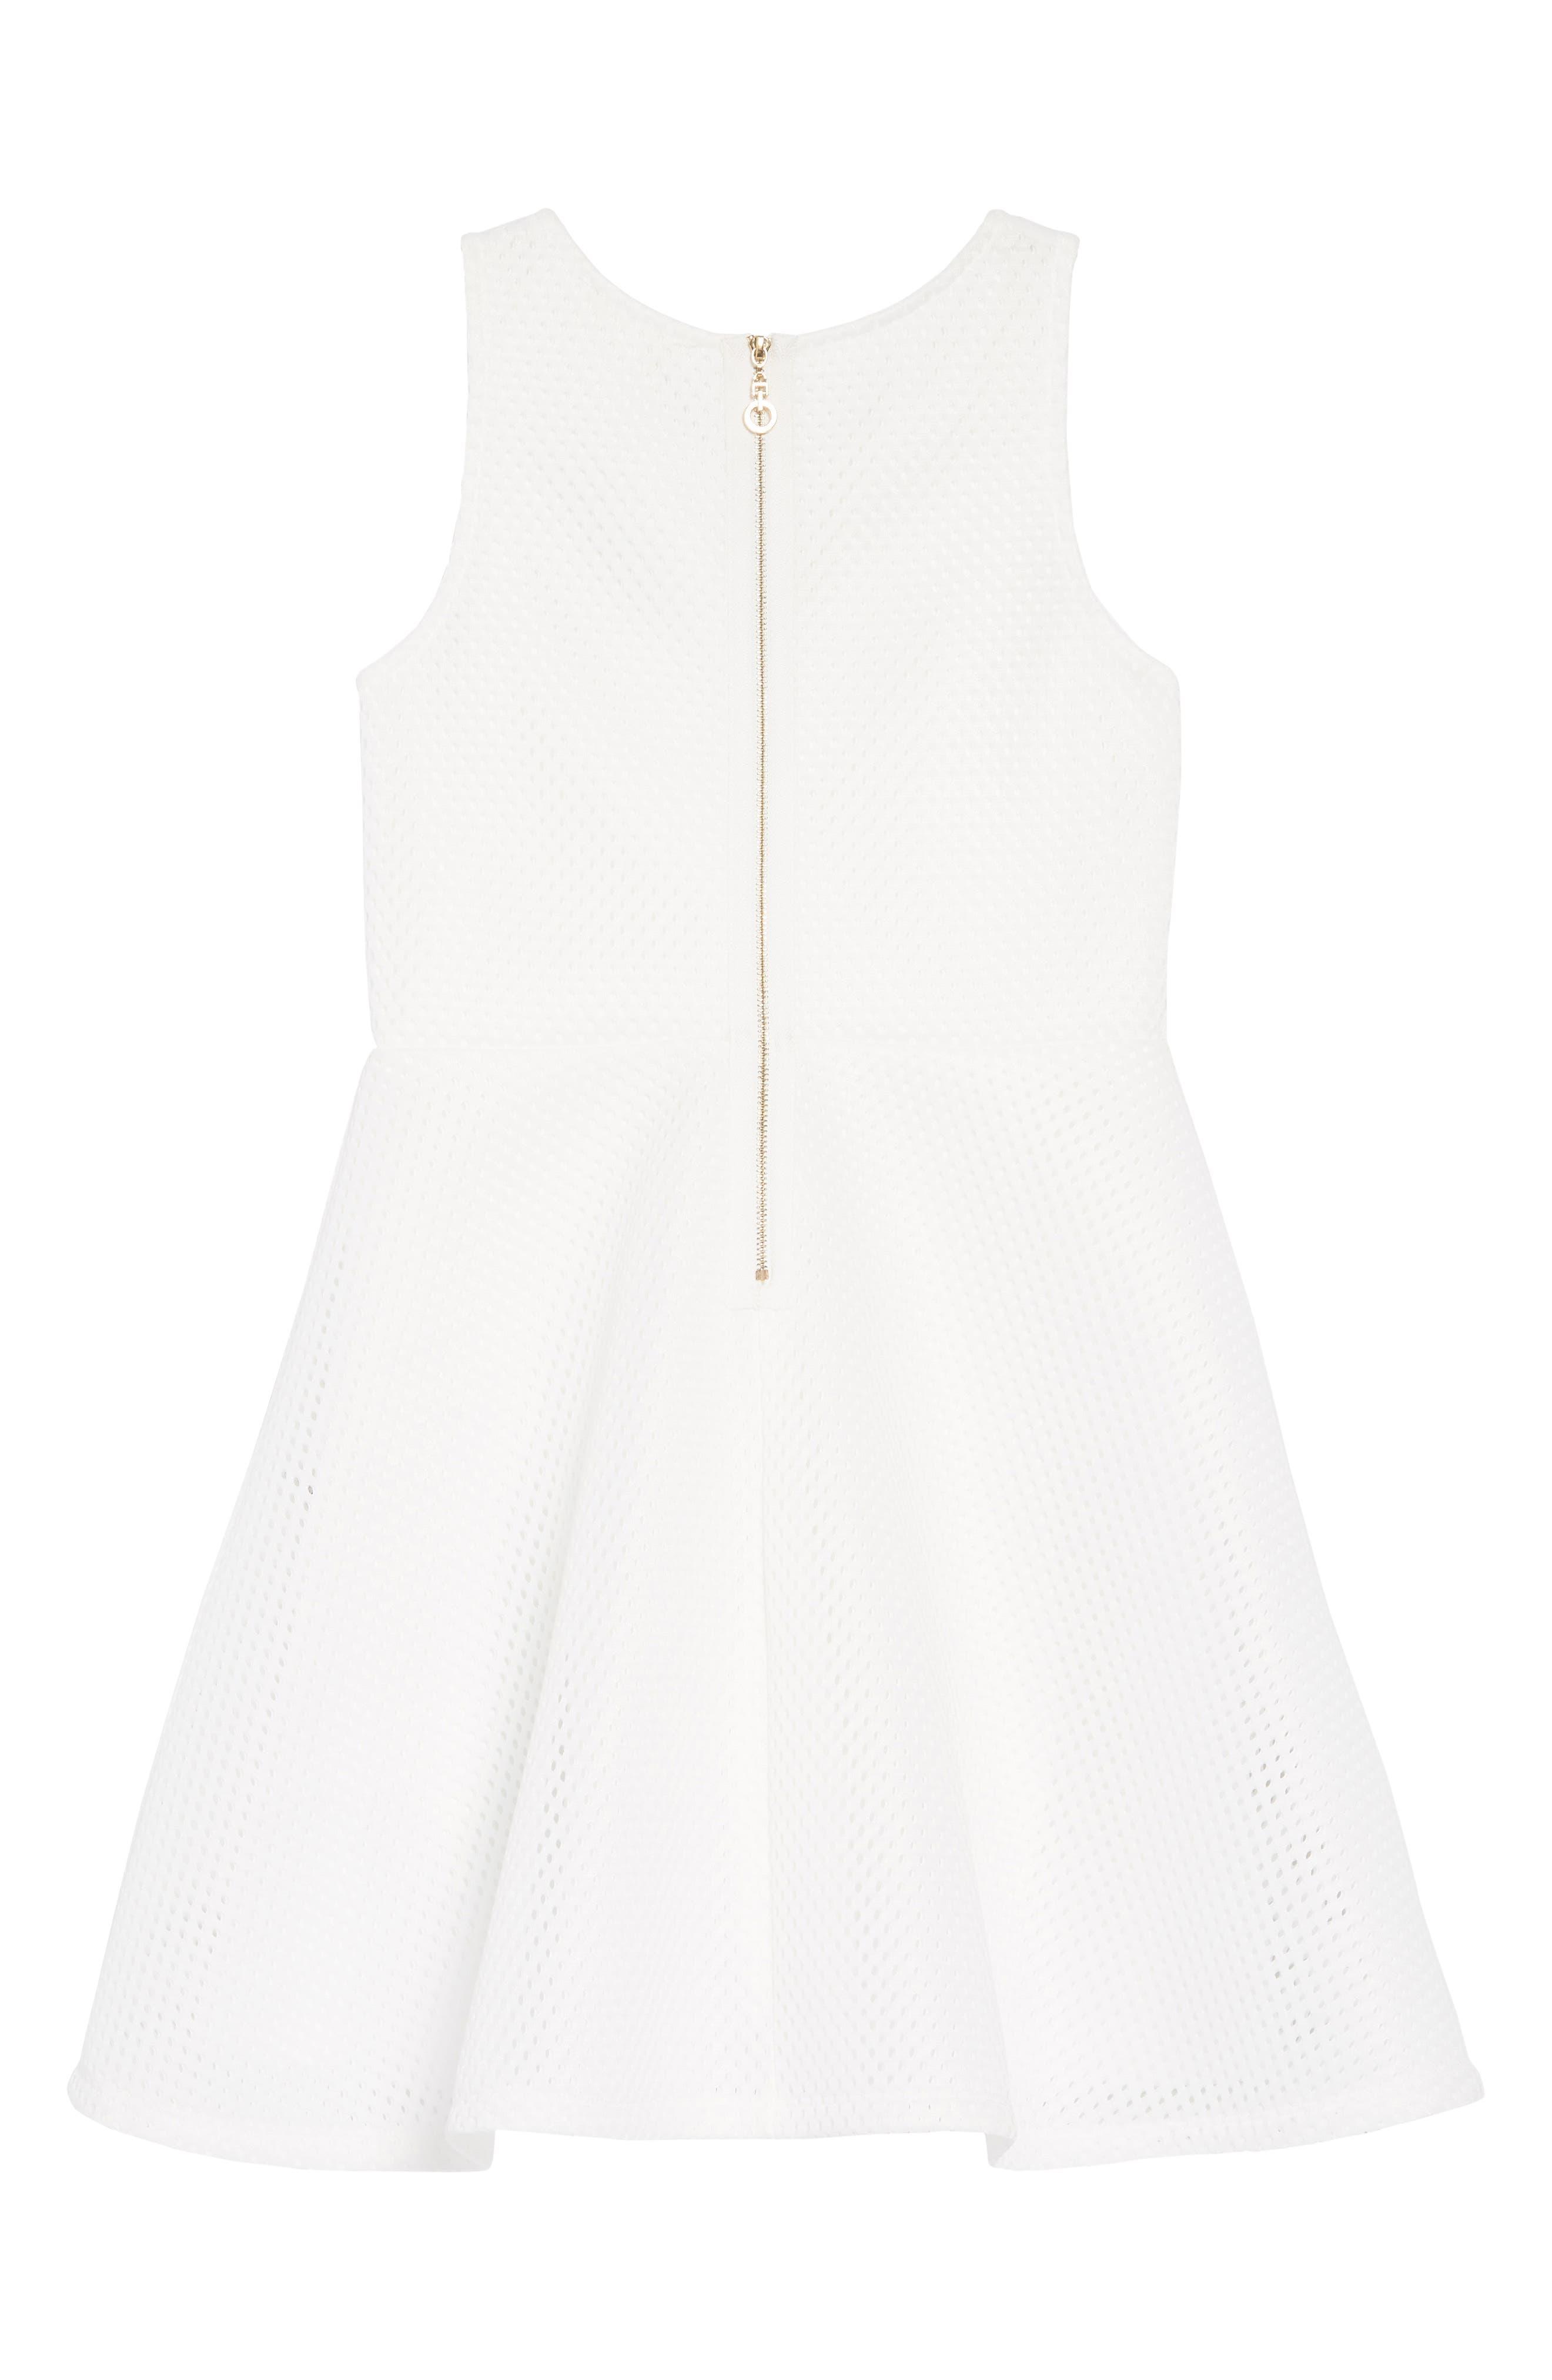 HANNAH BANANA,                             Embellished Techno Mesh Dress,                             Alternate thumbnail 2, color,                             WHITE